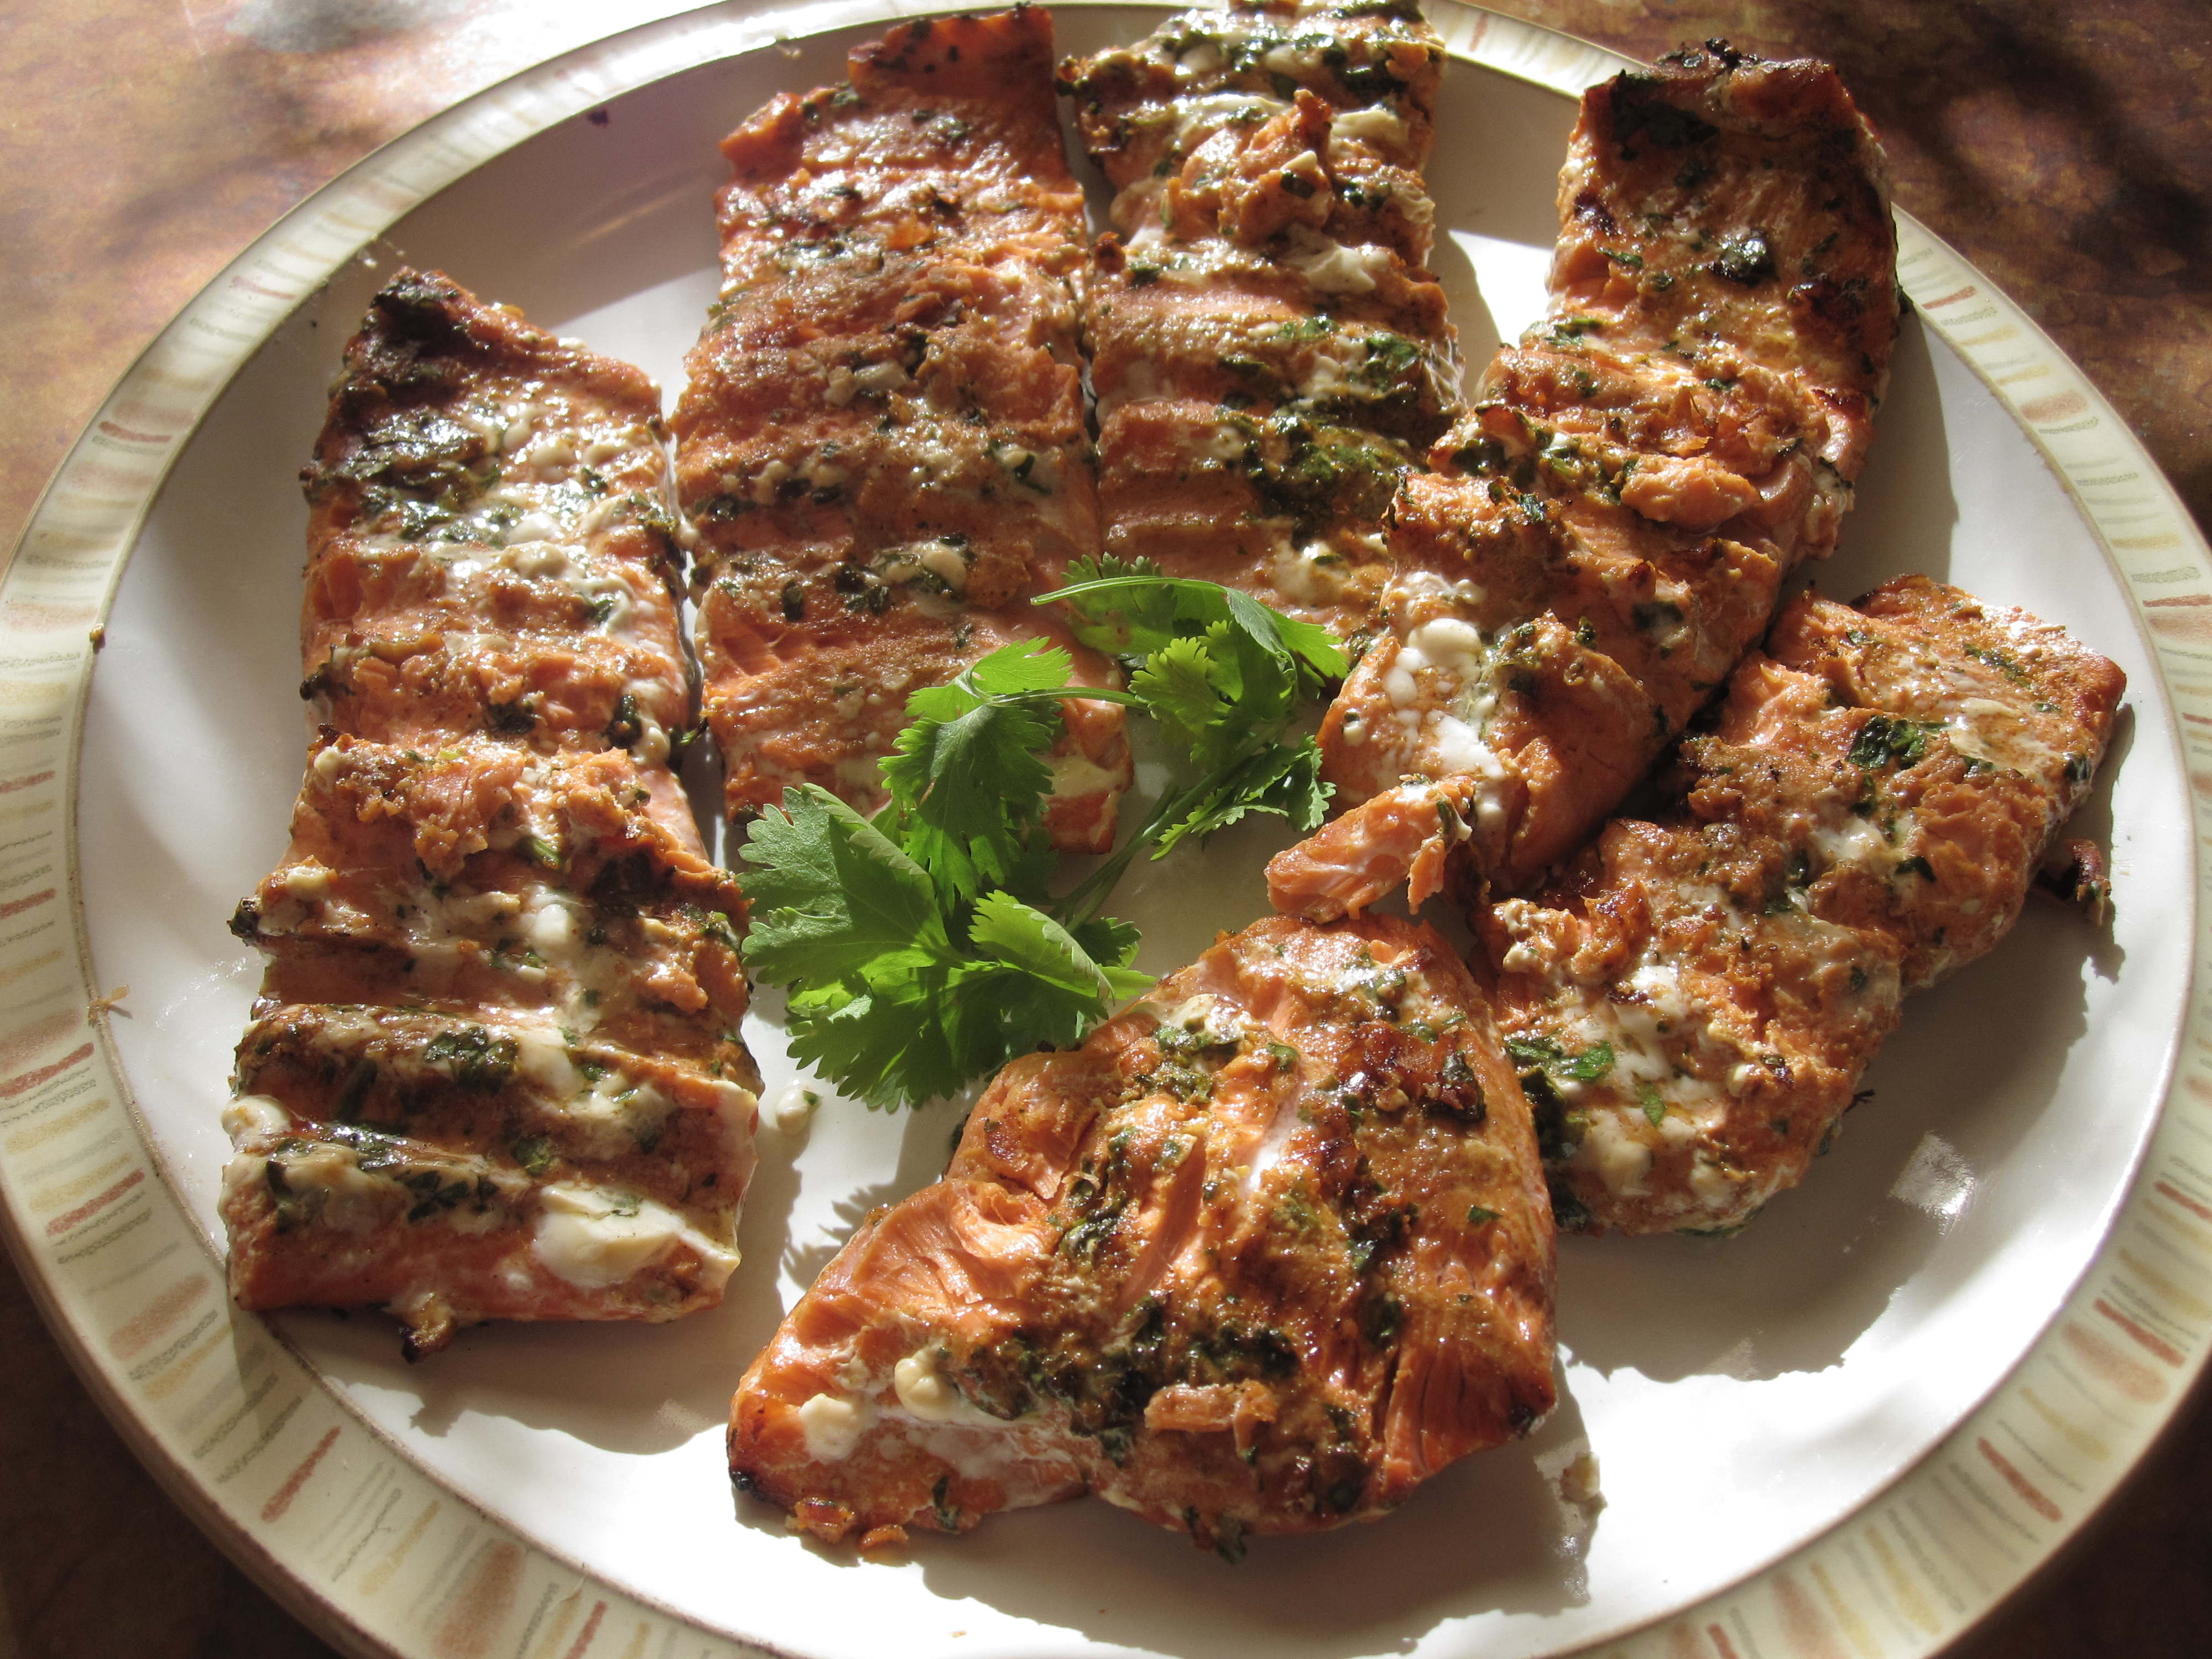 Quick and easy moroccan recipes genius kitchen forumfinder Gallery